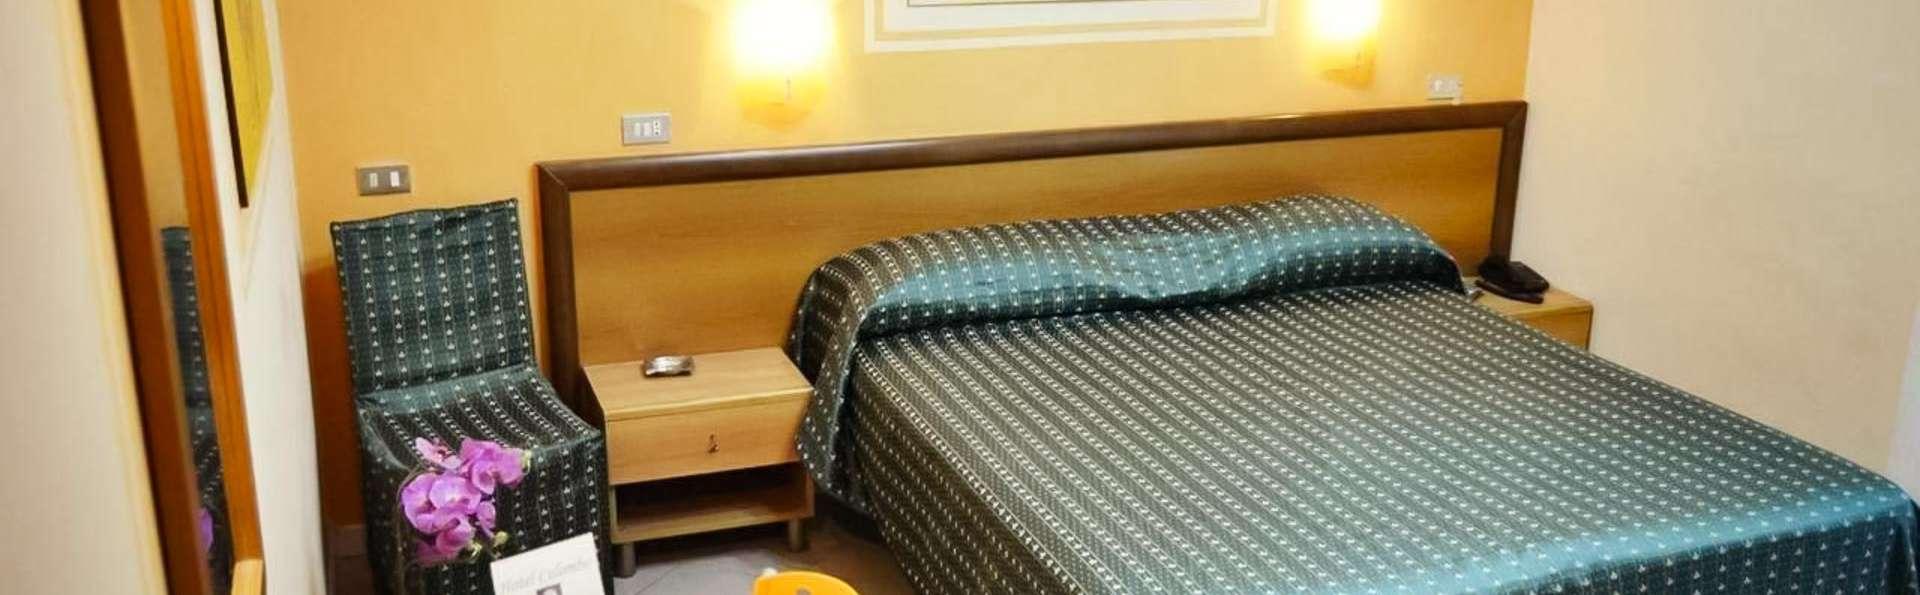 Hotel Colombo - EDIT_ROOM_01.jpg